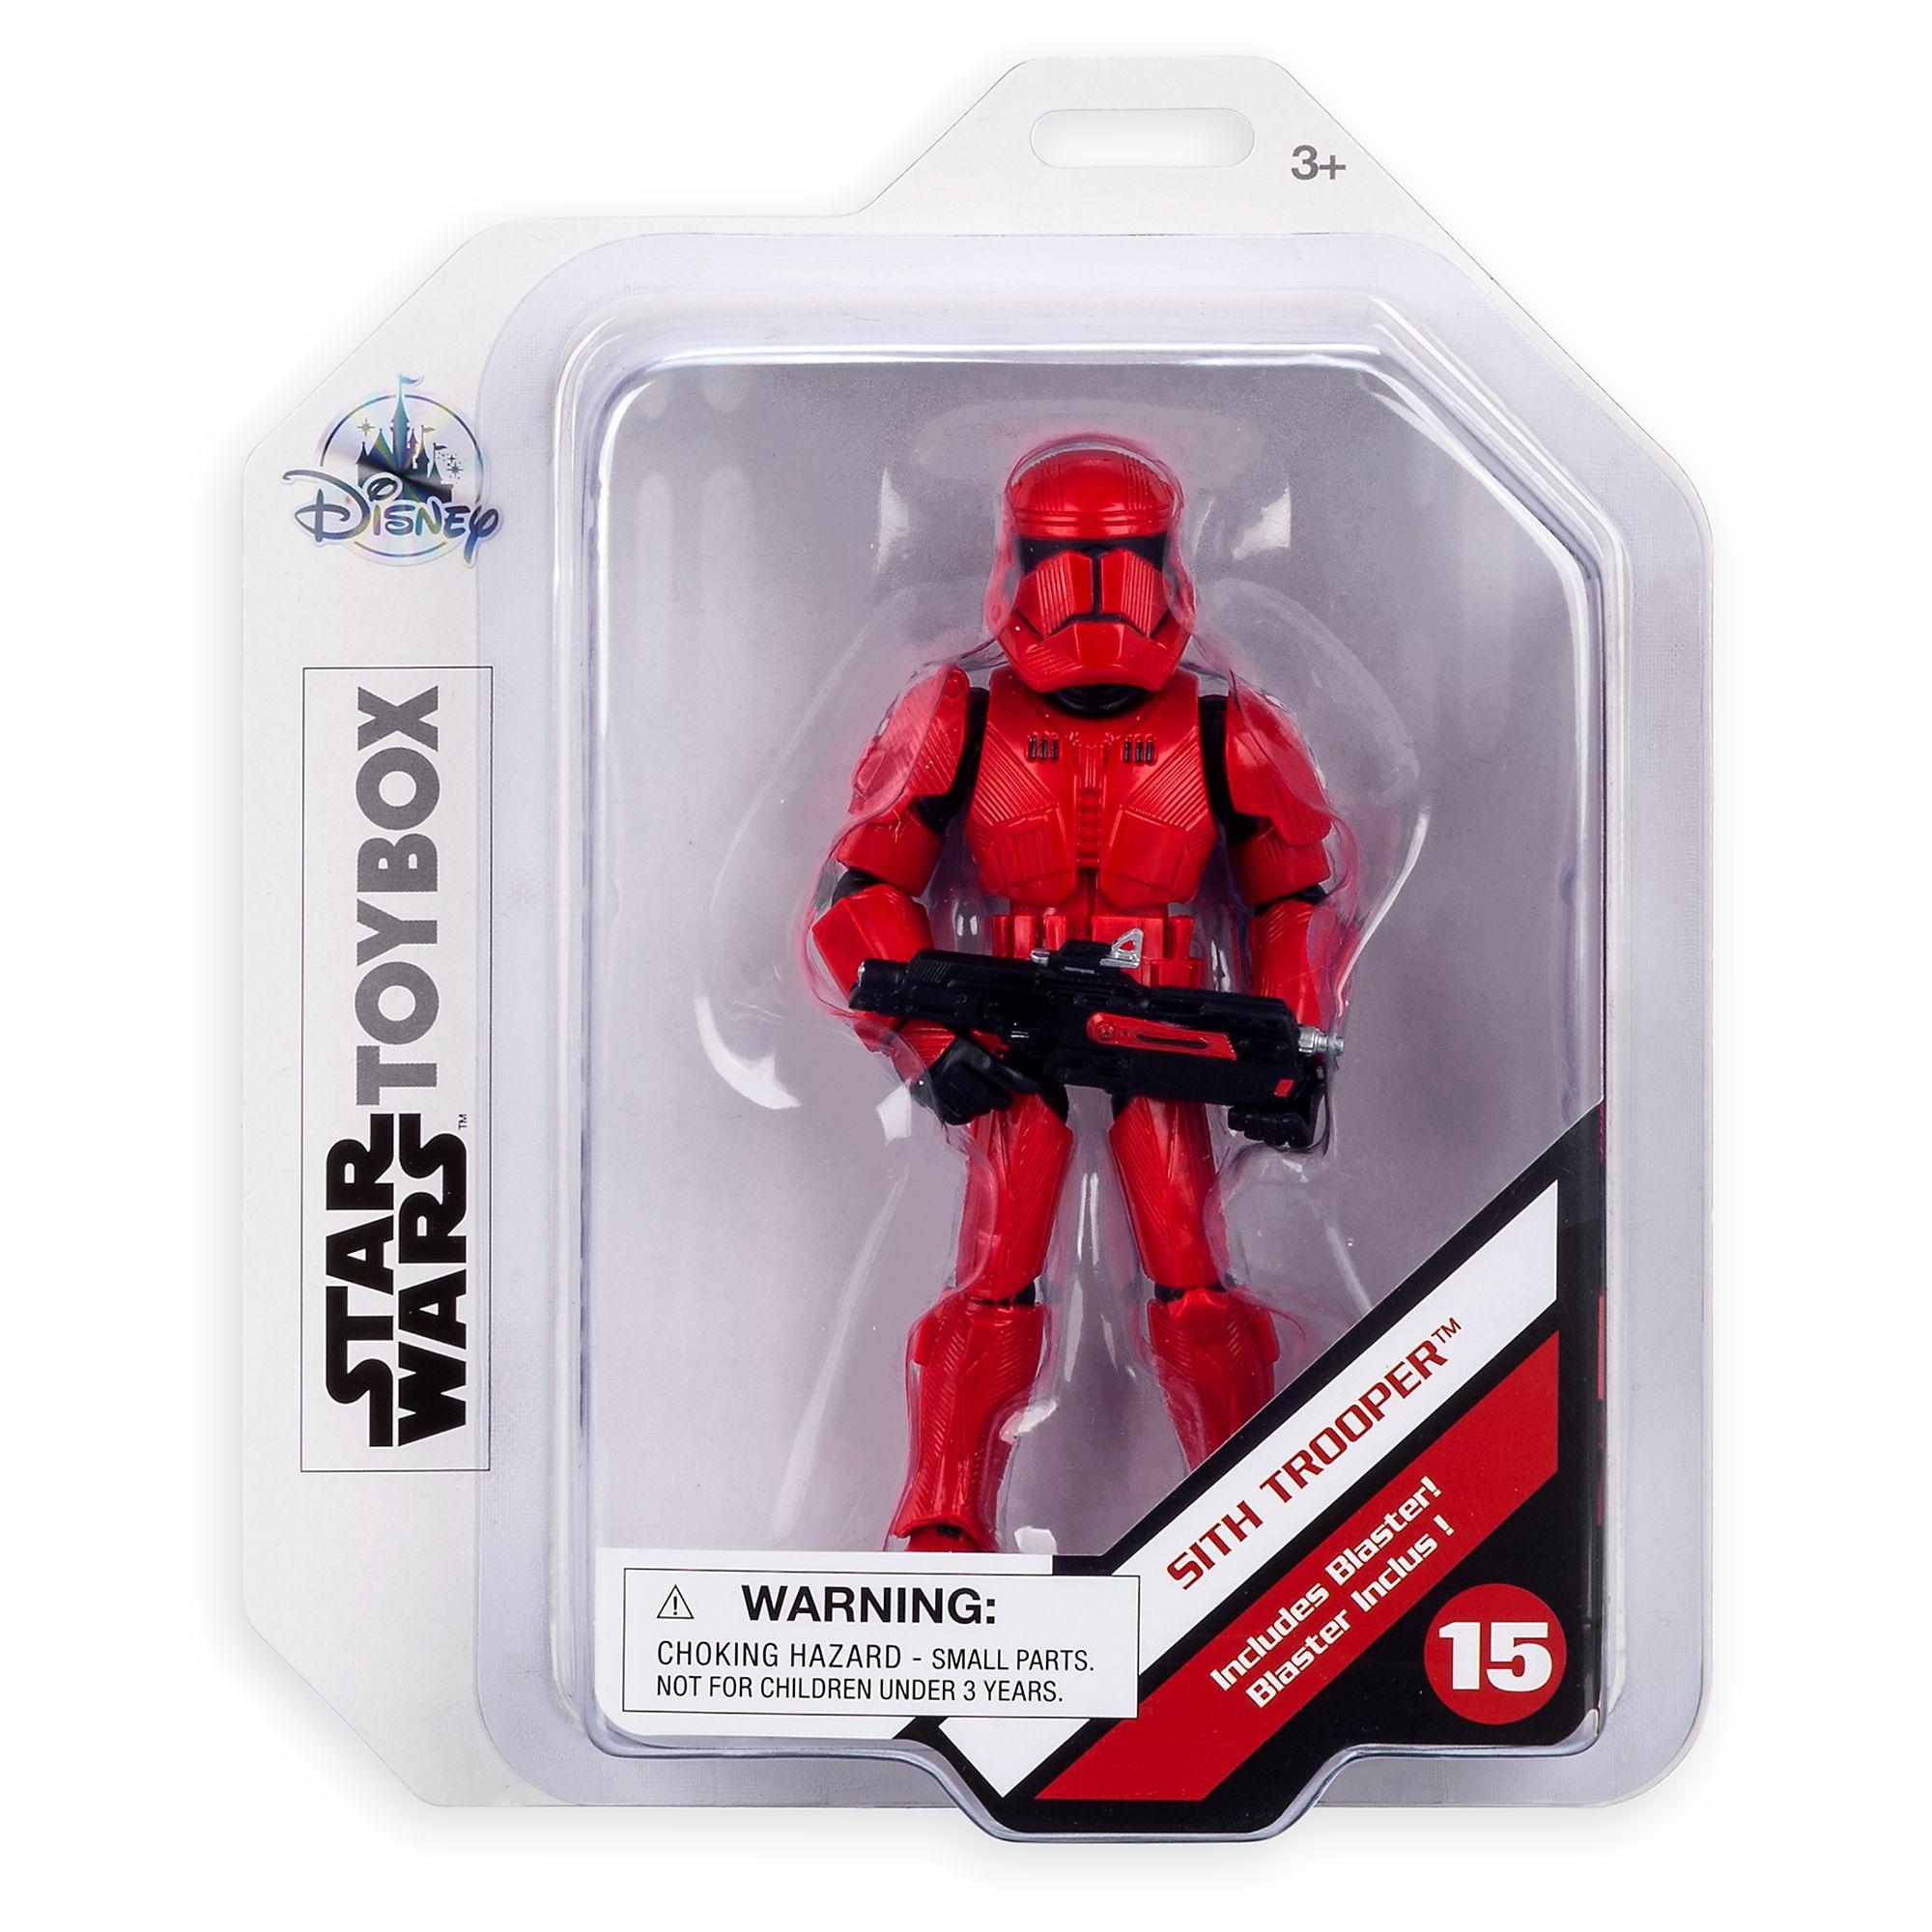 Sith Trooper -